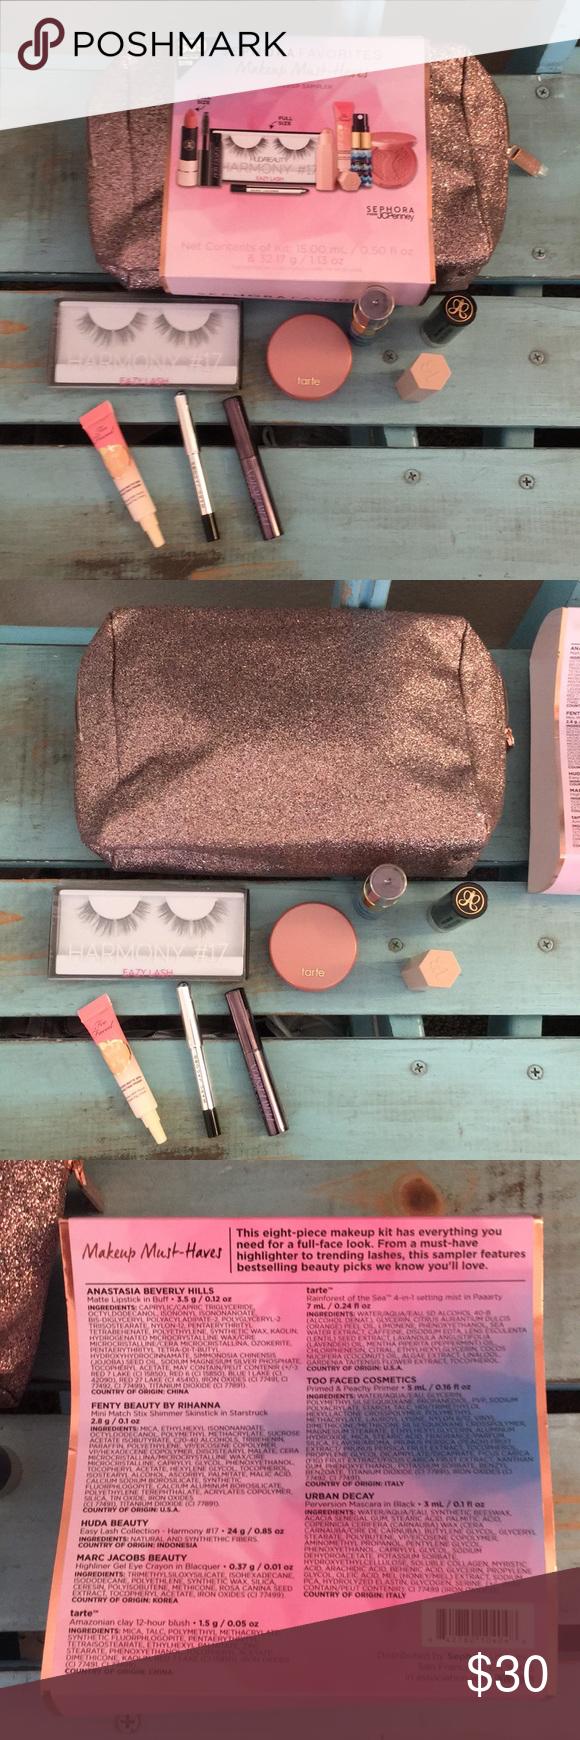 Sephora Favorites Makeup MustHaves Sampler🎀 Great gift